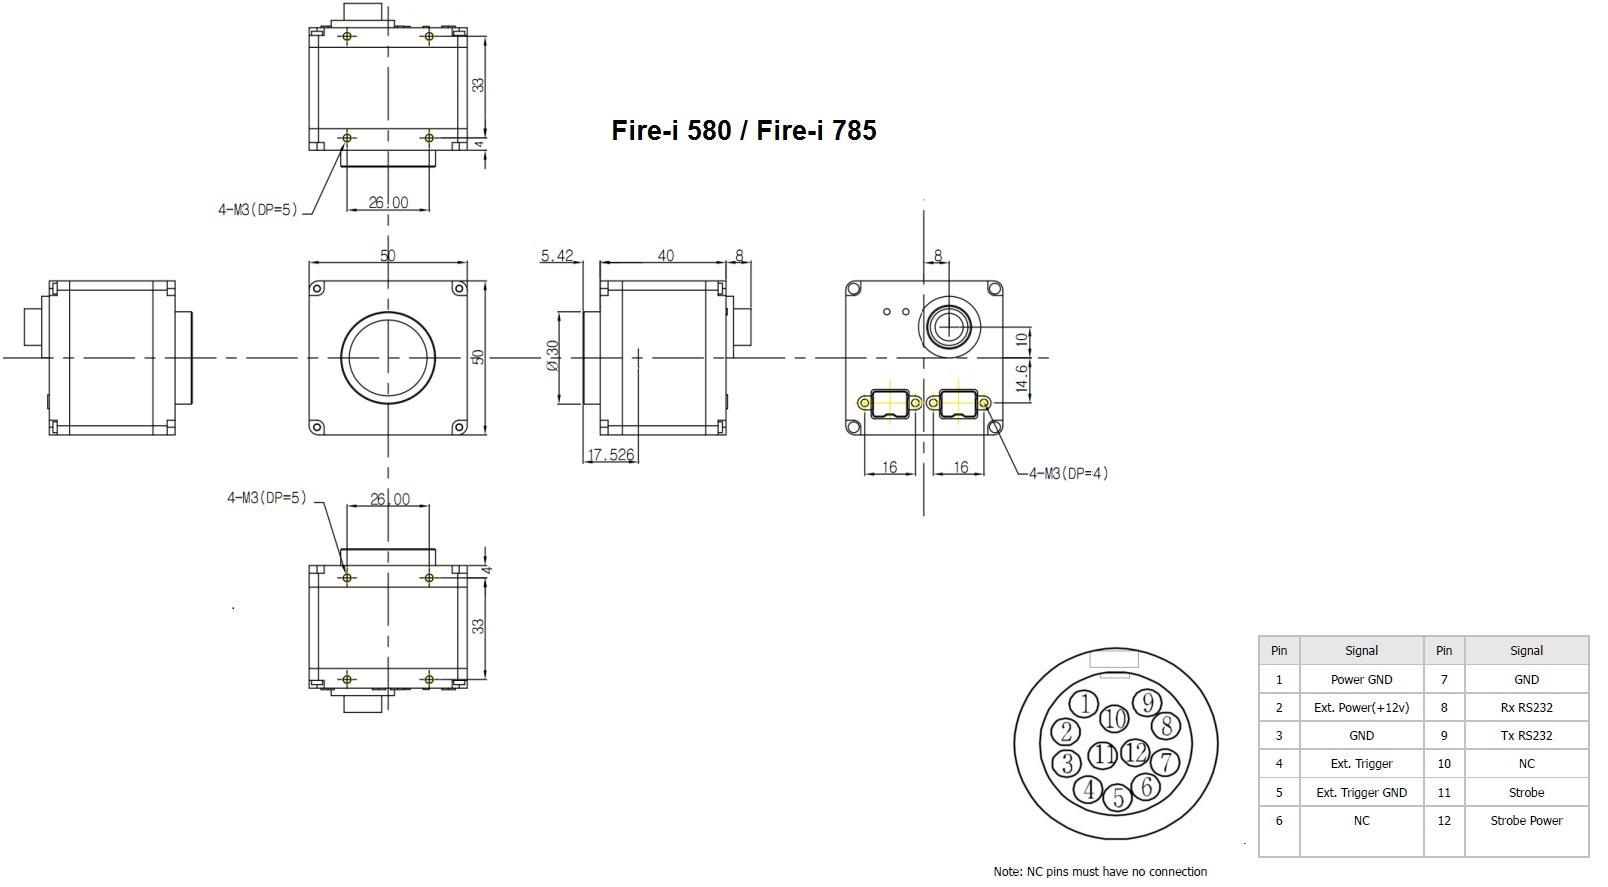 firewire 800 industrial cameras unibrain mechanical diagram fire i 580 fire i 785